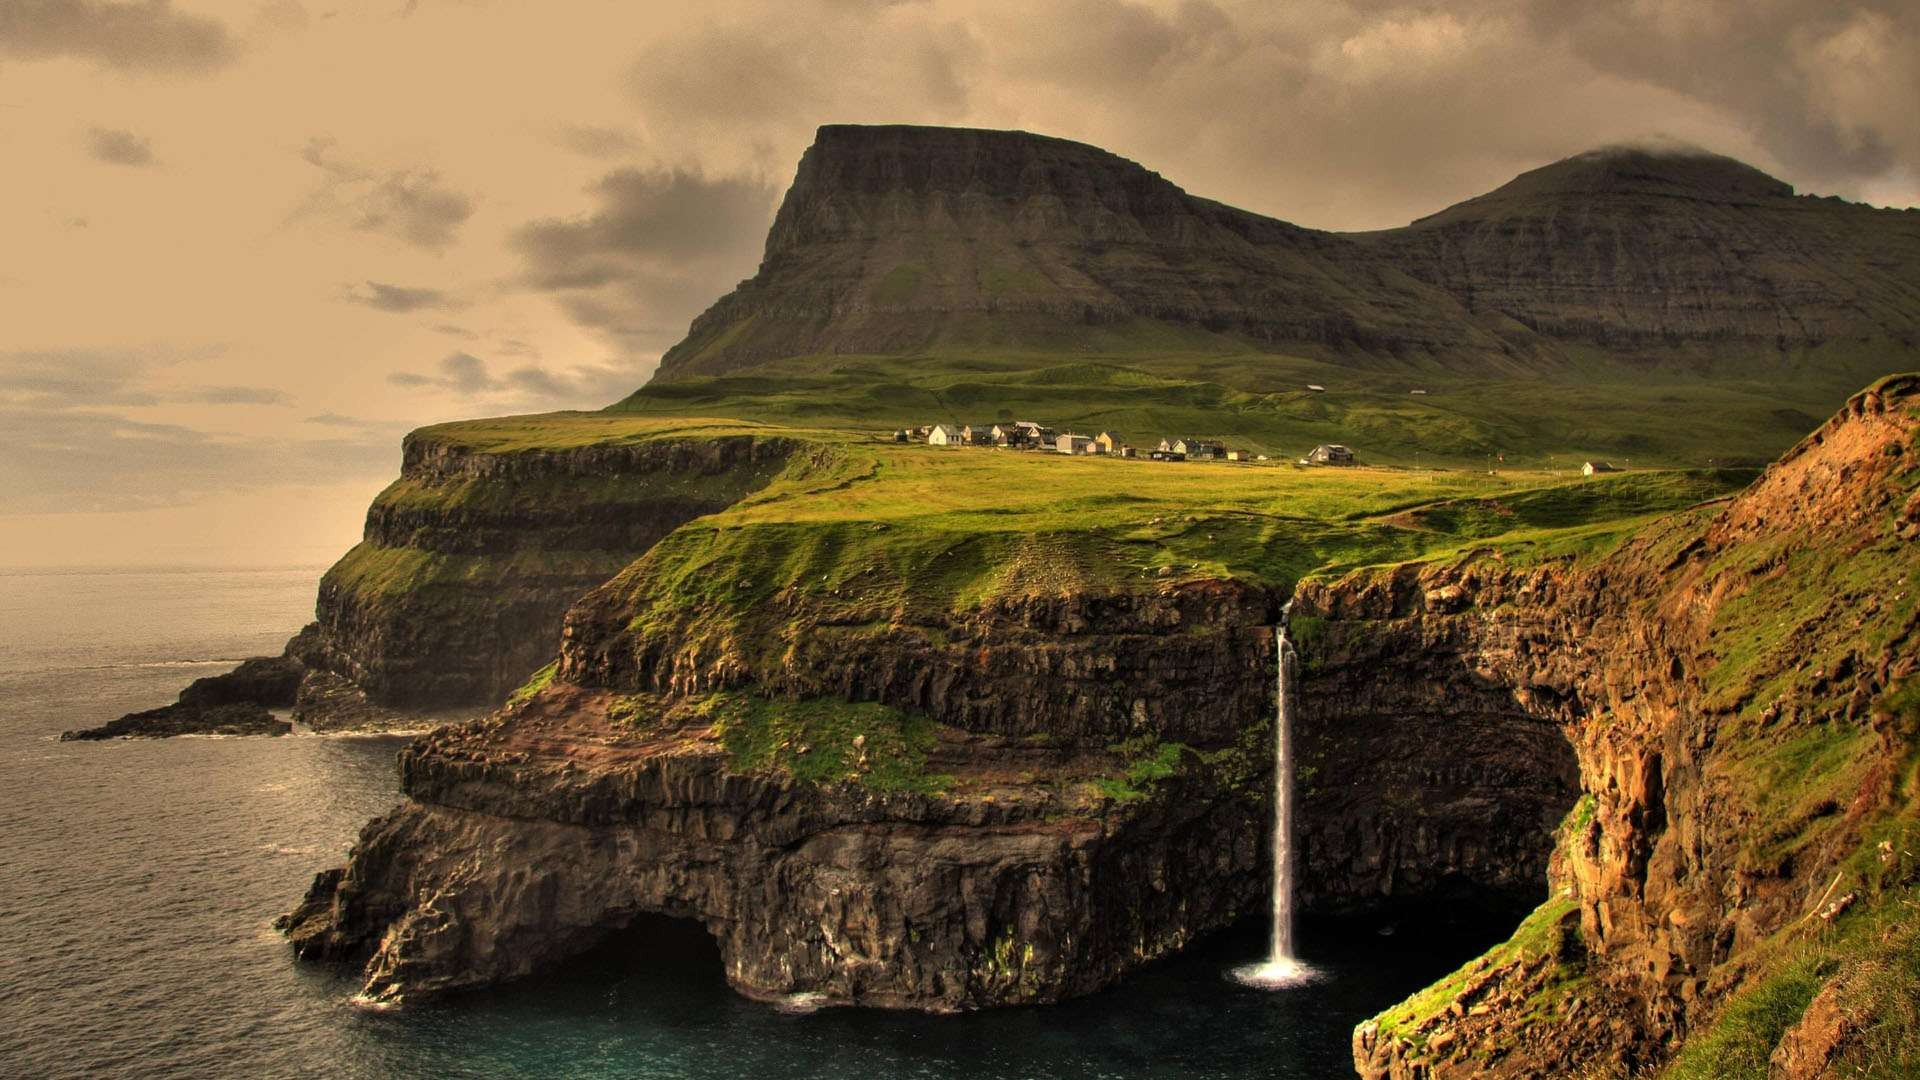 Ireland-landscape-wallpaper.jpg